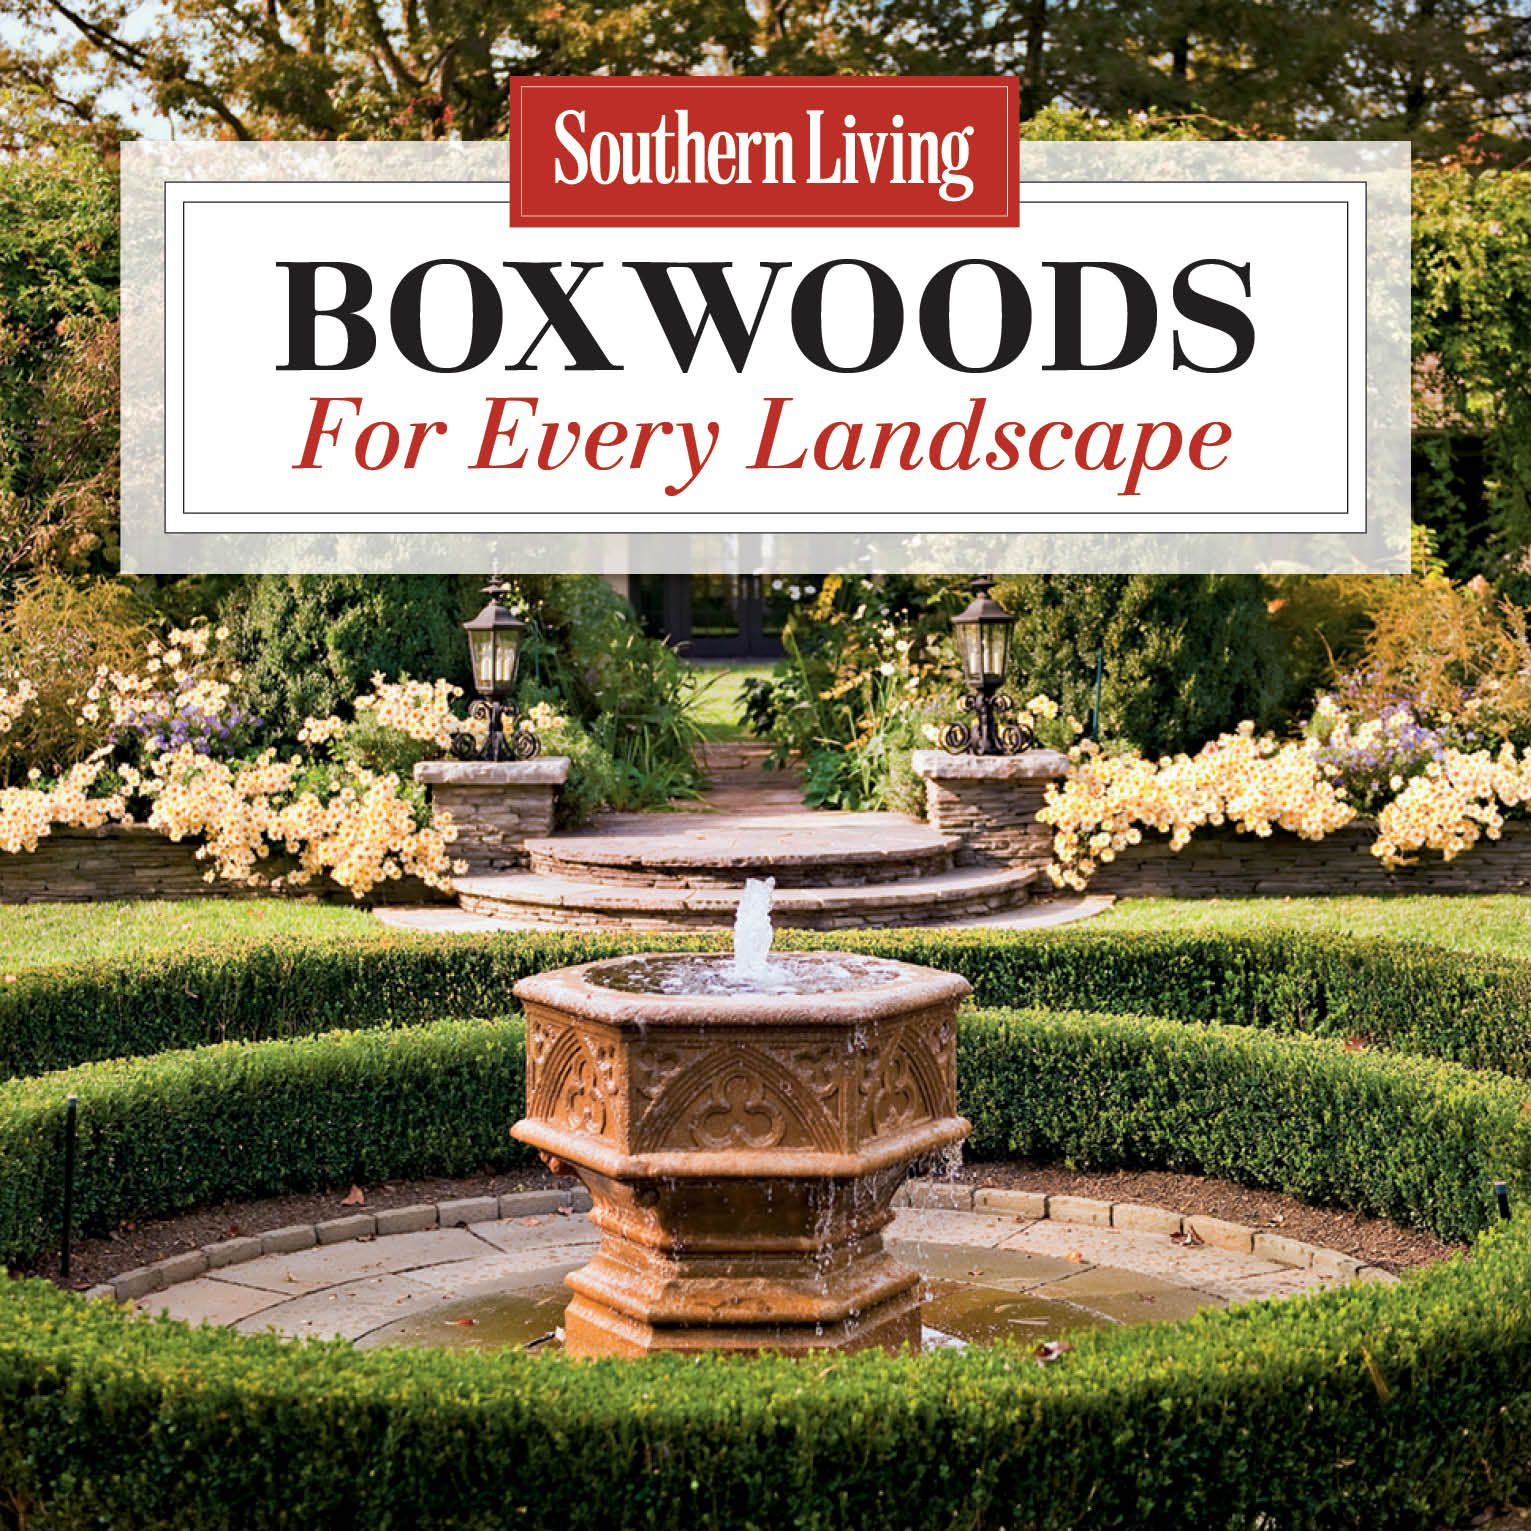 Lawn Begone 7 Ideas For Front Garden Landscapes: Boxwoods For Every Landscape